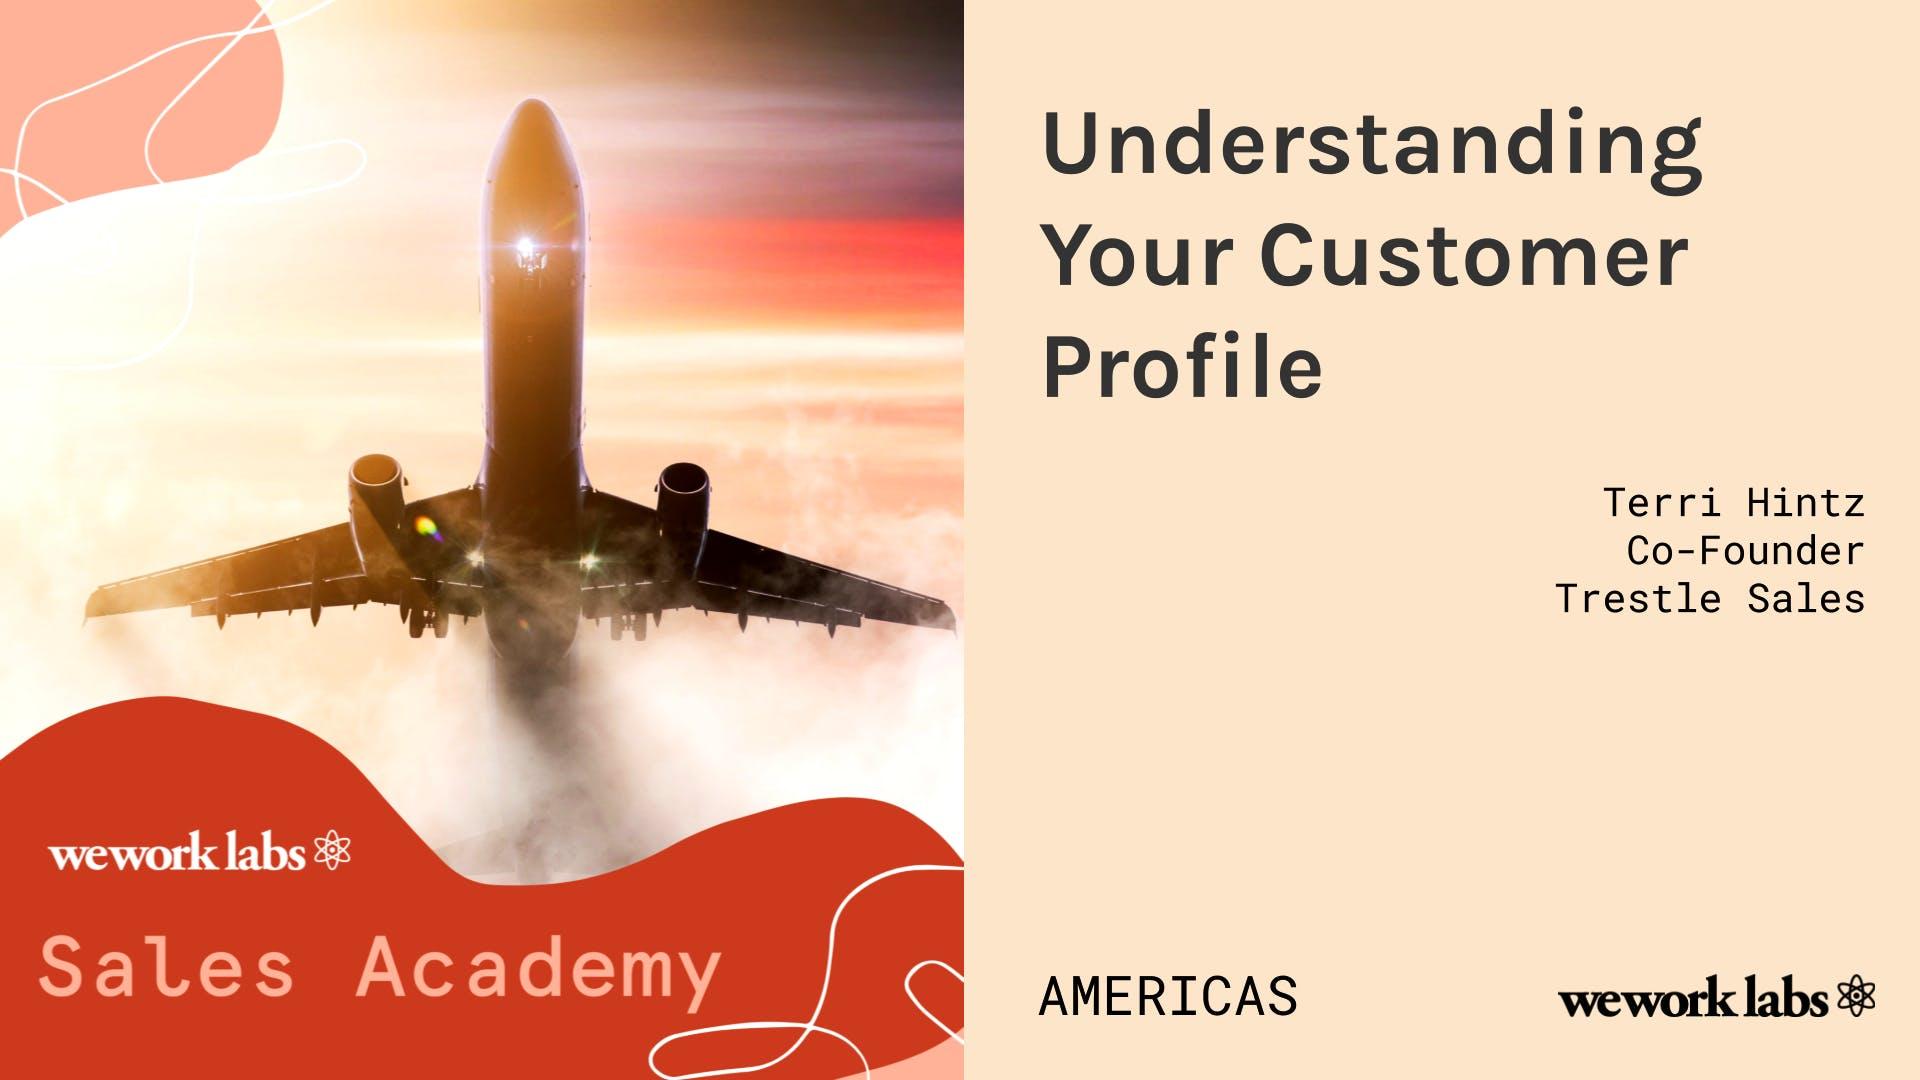 Sales Academy (Americas): Understanding Your Customer Profile